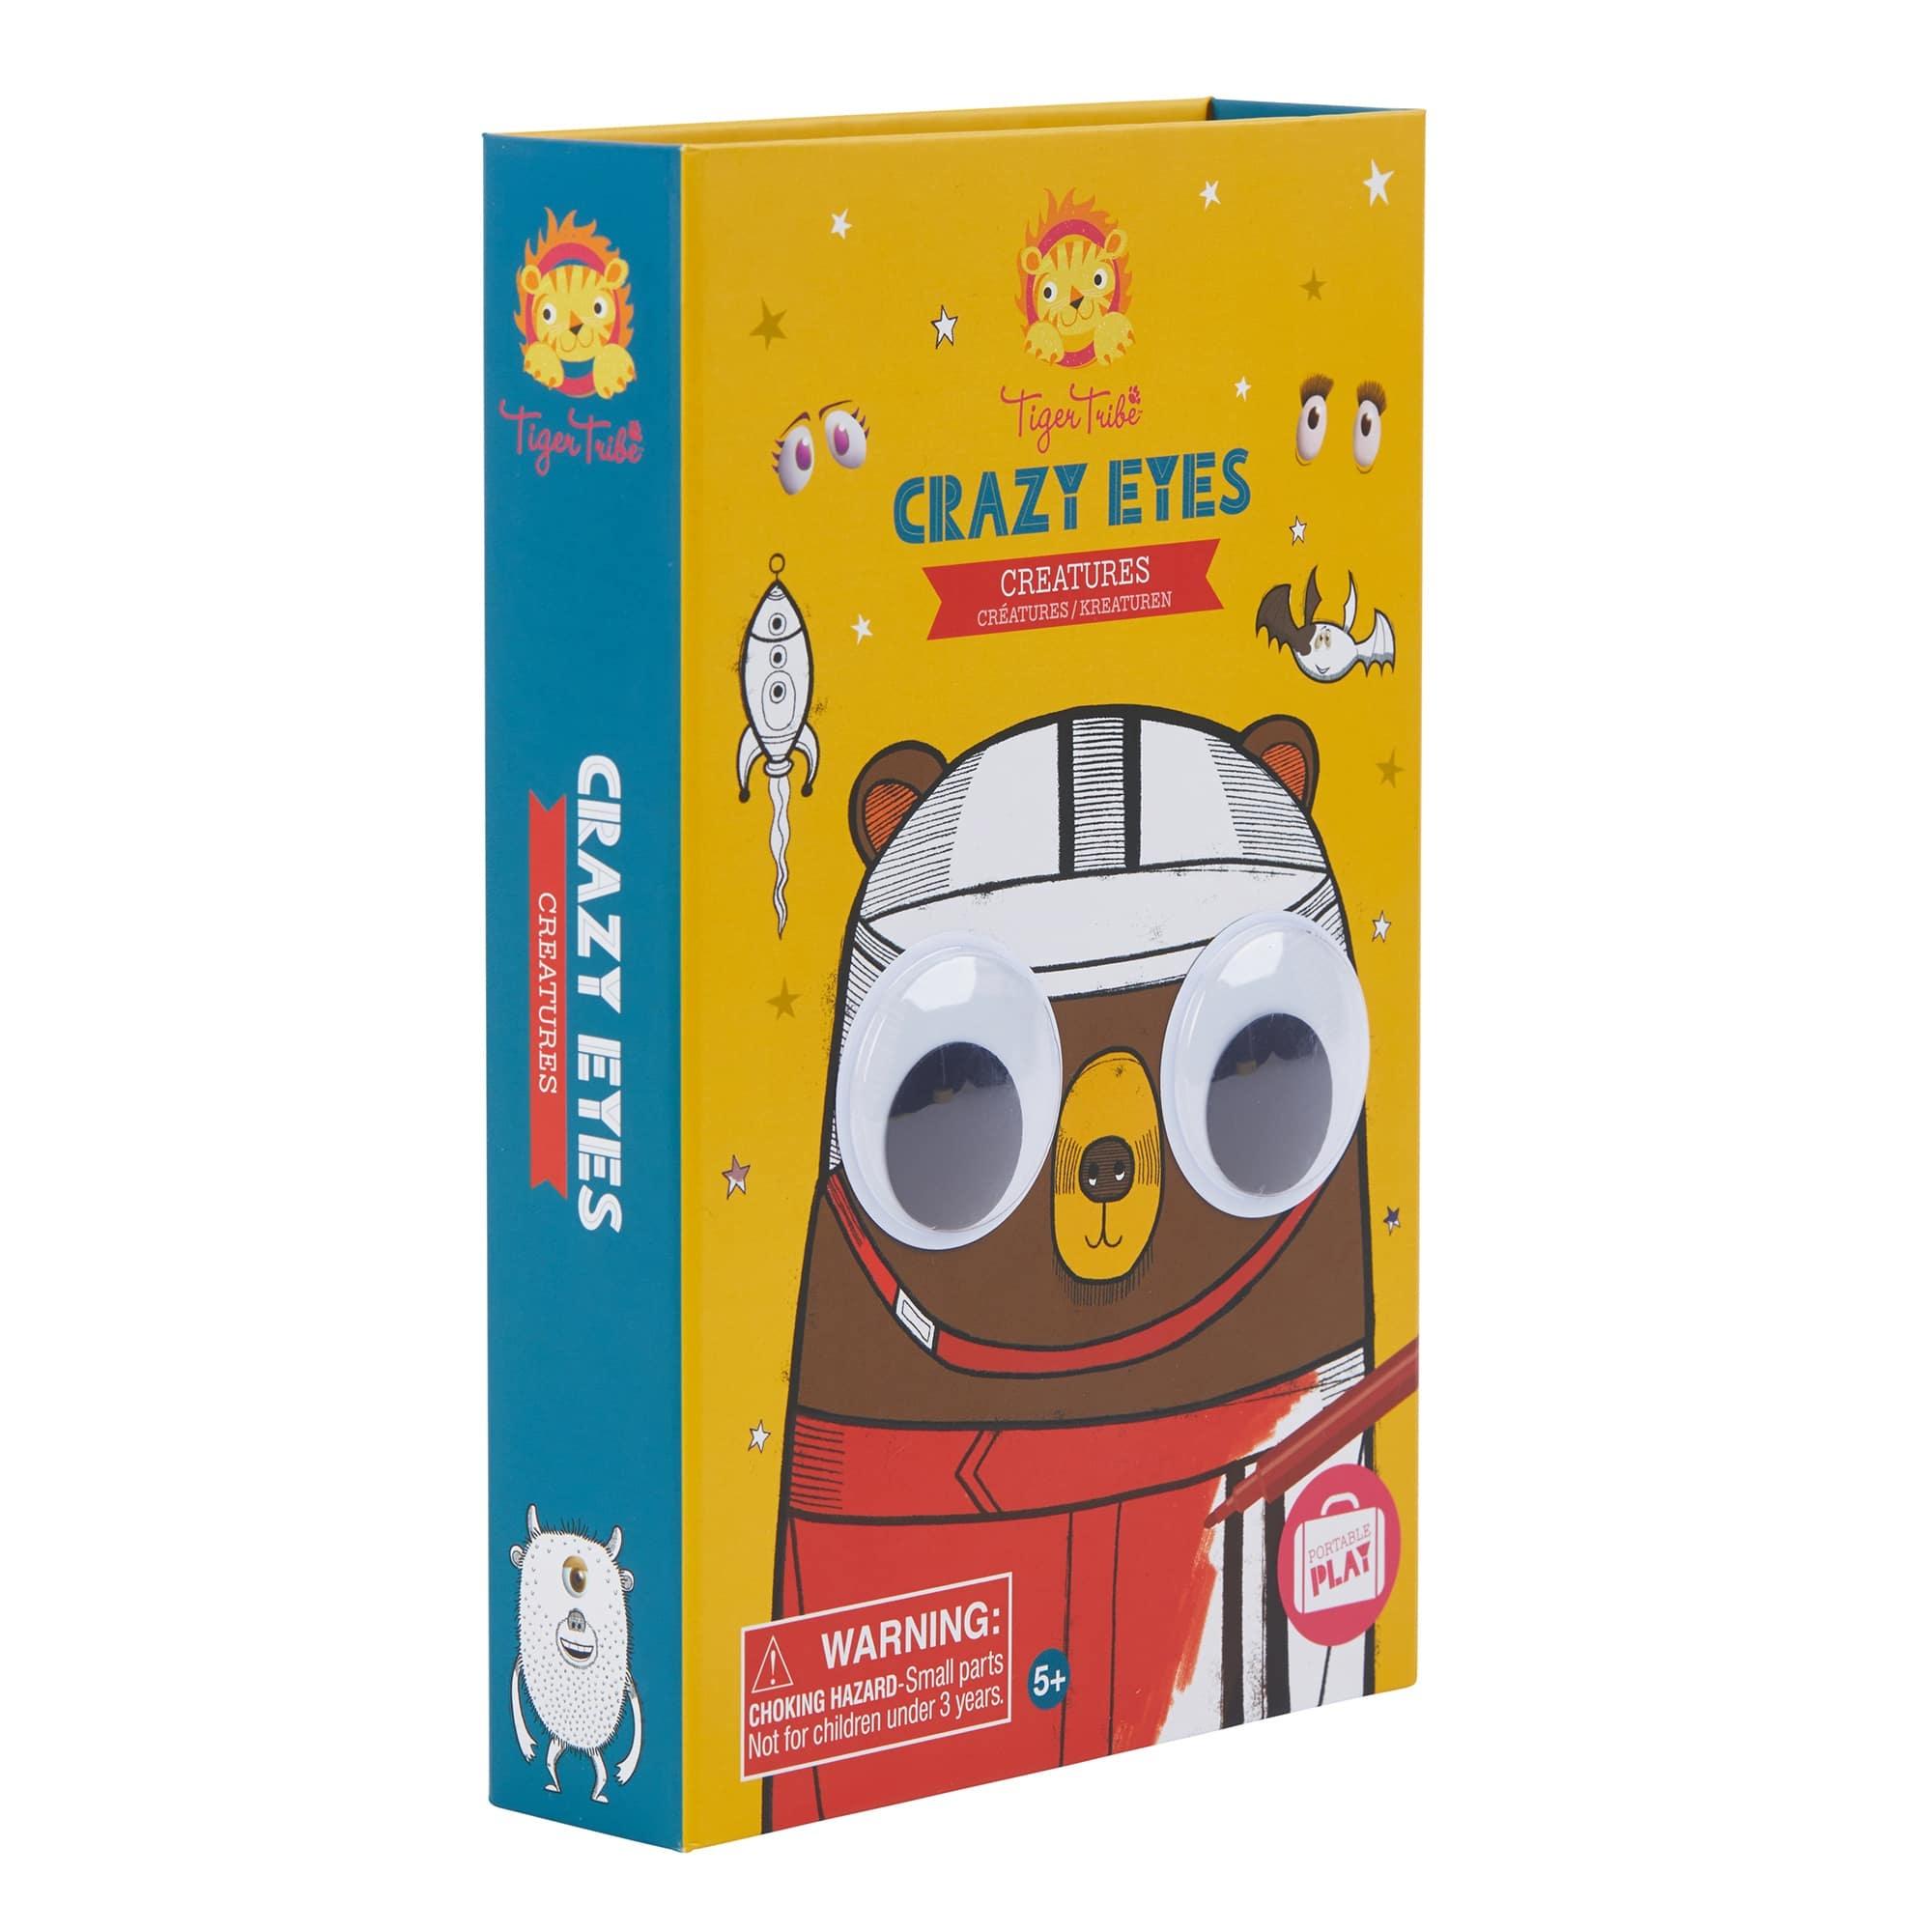 Crazy Eyes Creatures-1